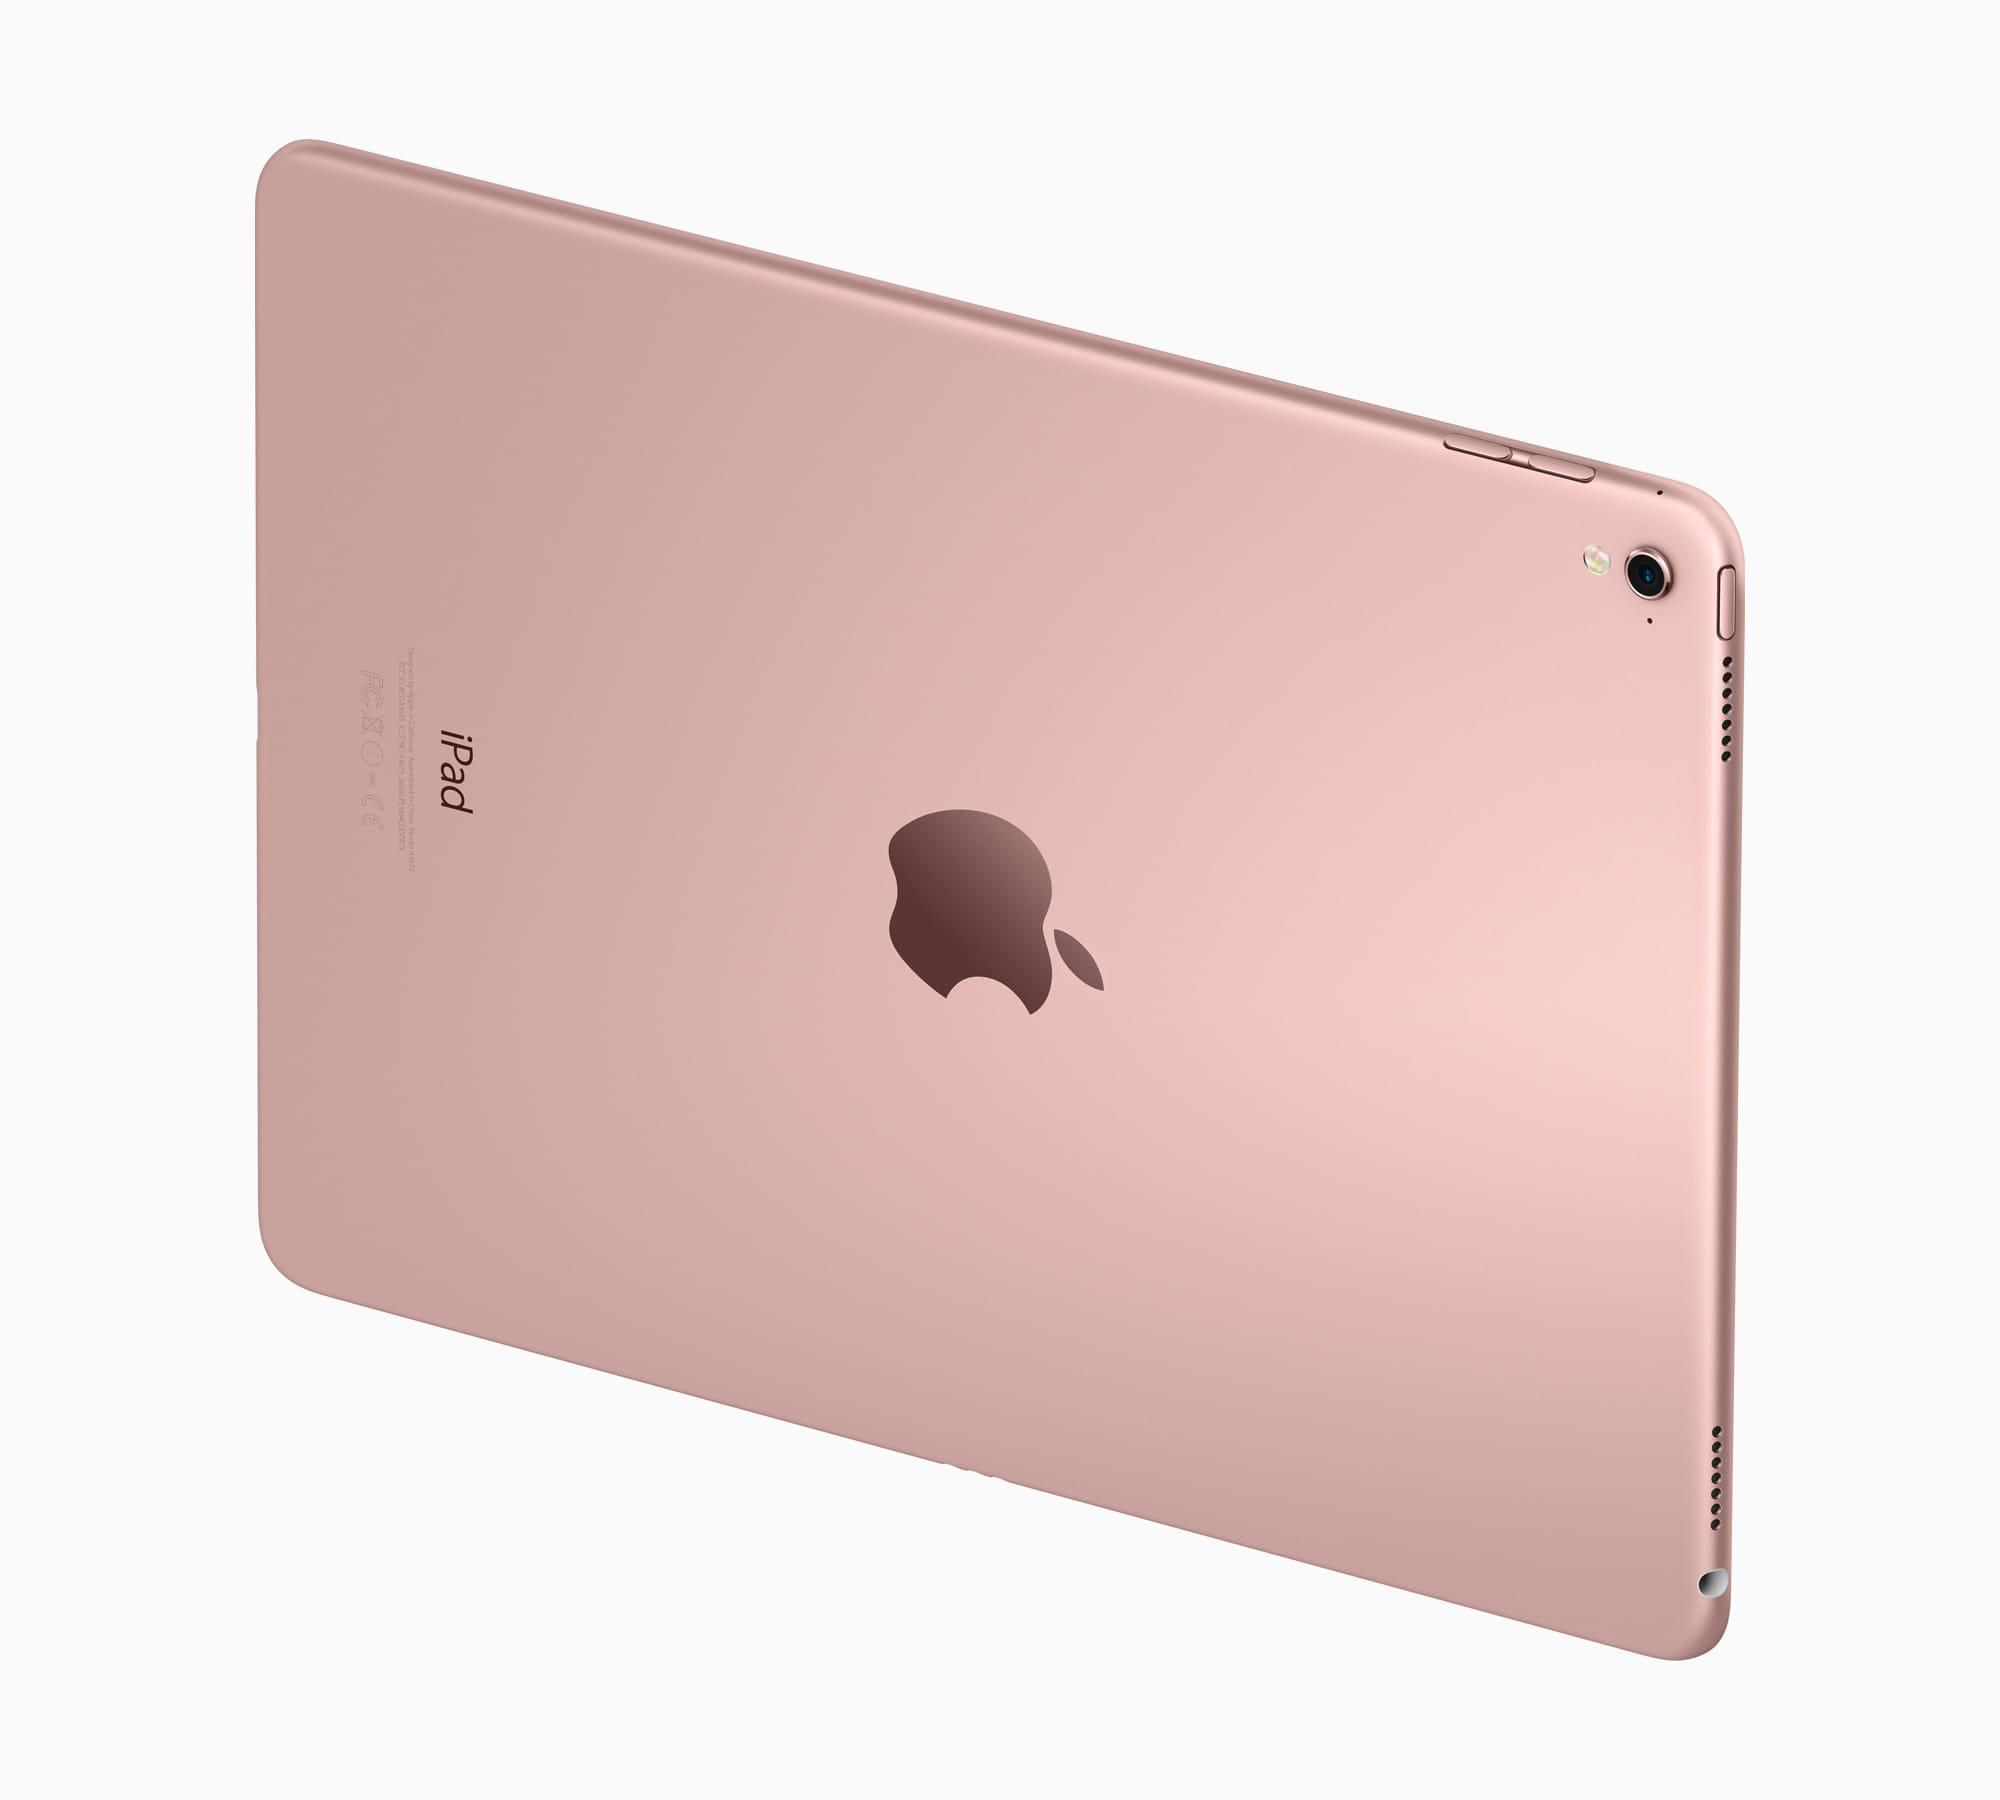 iPad Pro 9.7 side rose gold